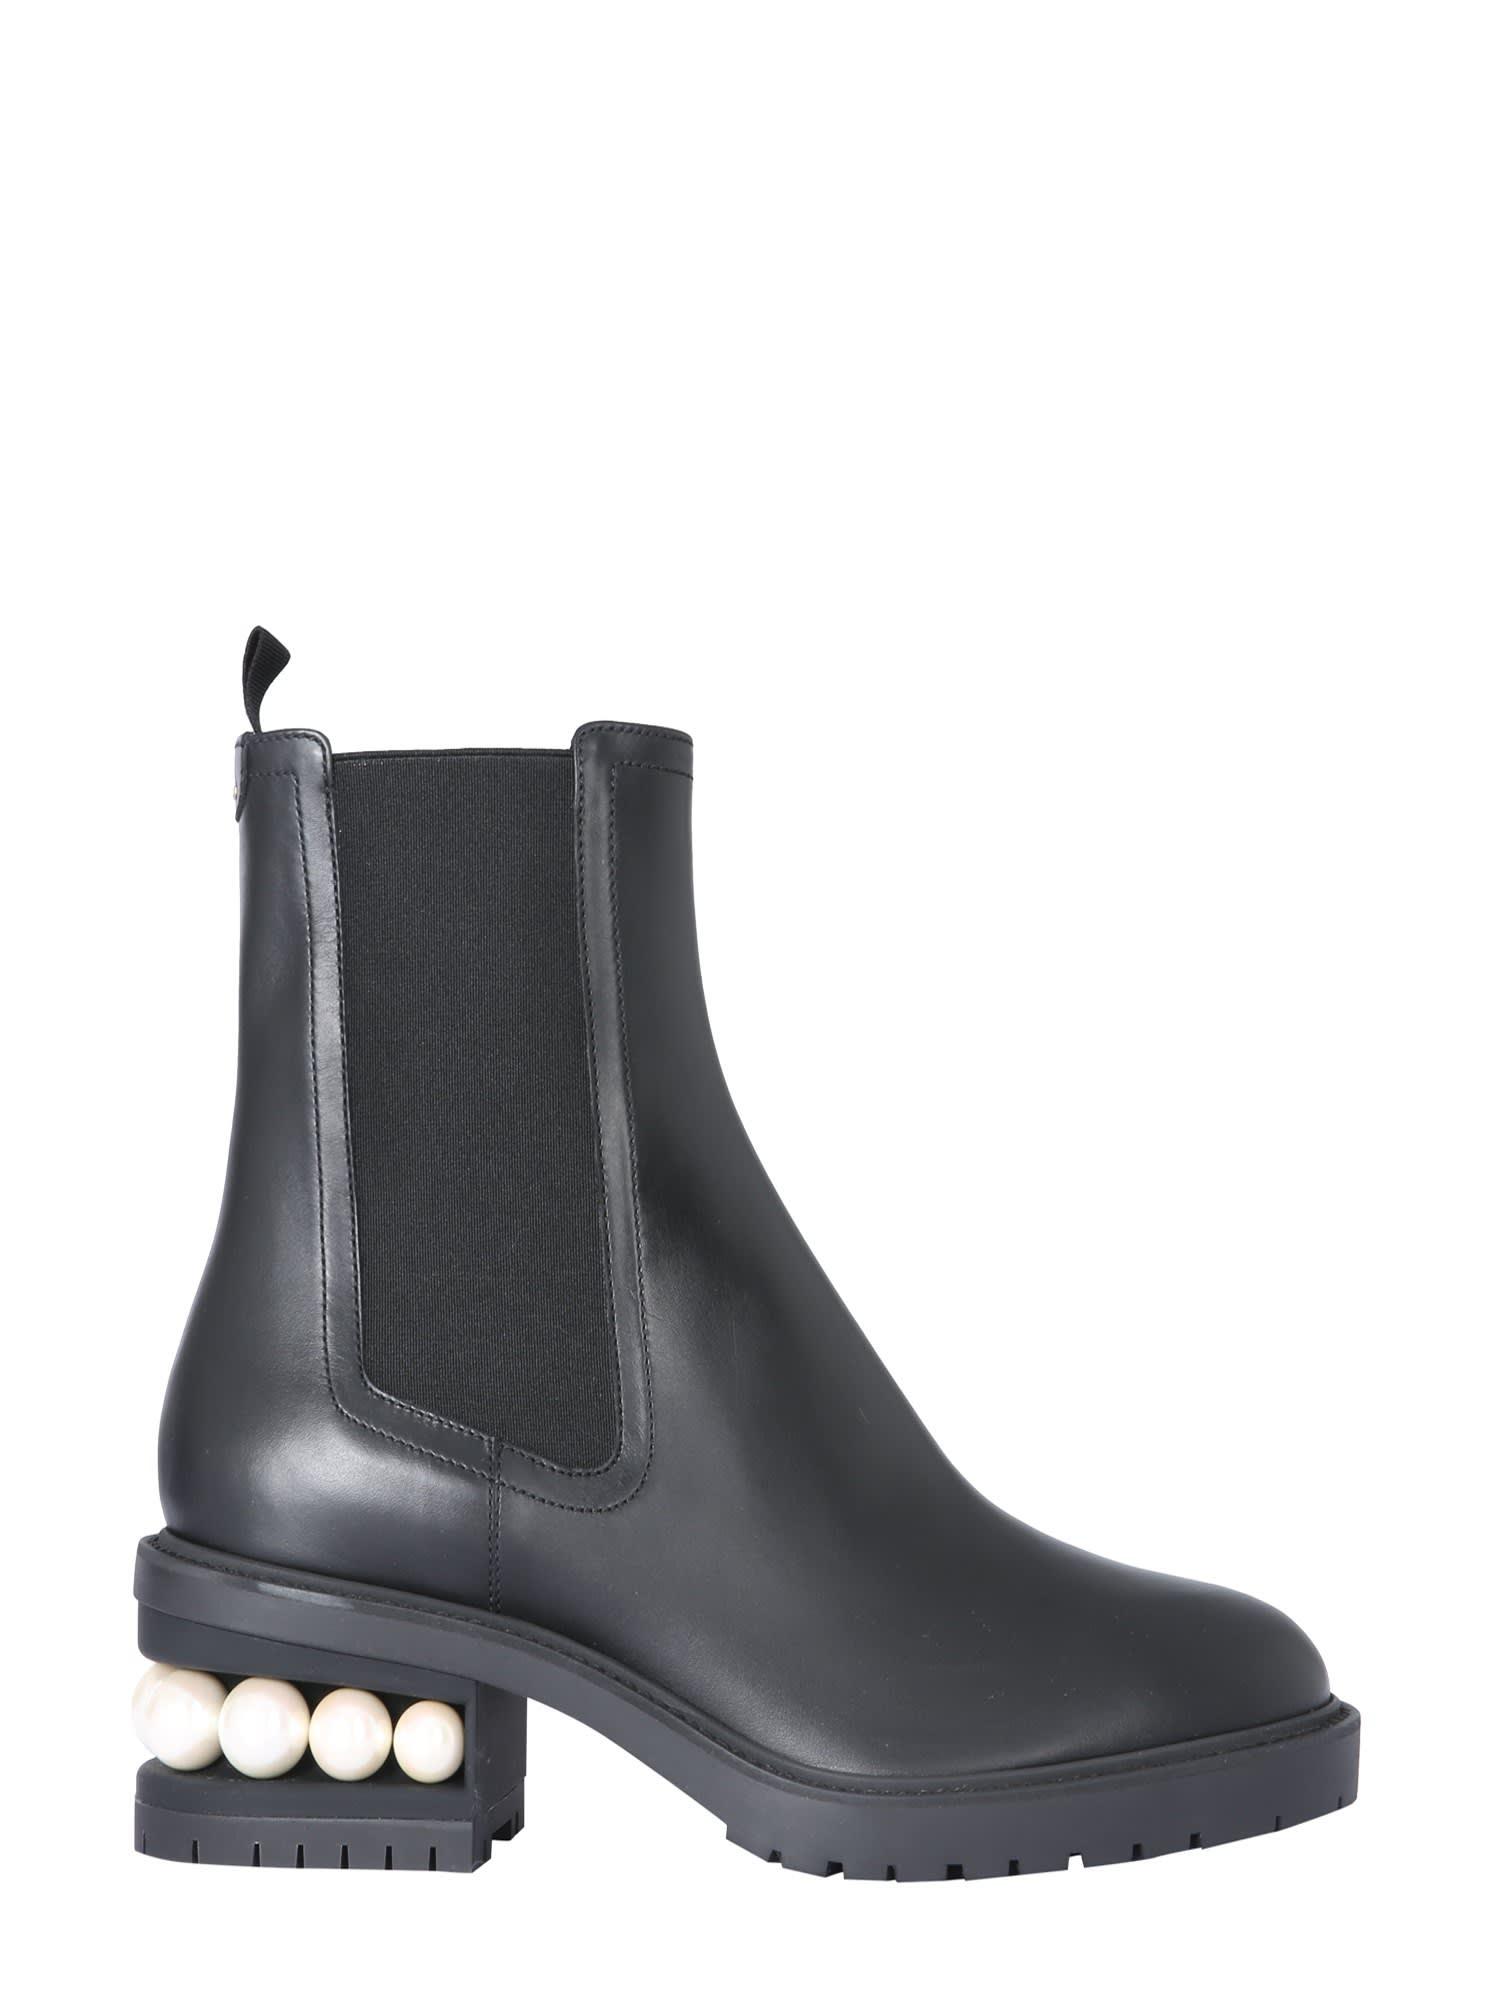 Buy Nicholas Kirkwood Casati Chelsea Boots online, shop Nicholas Kirkwood shoes with free shipping